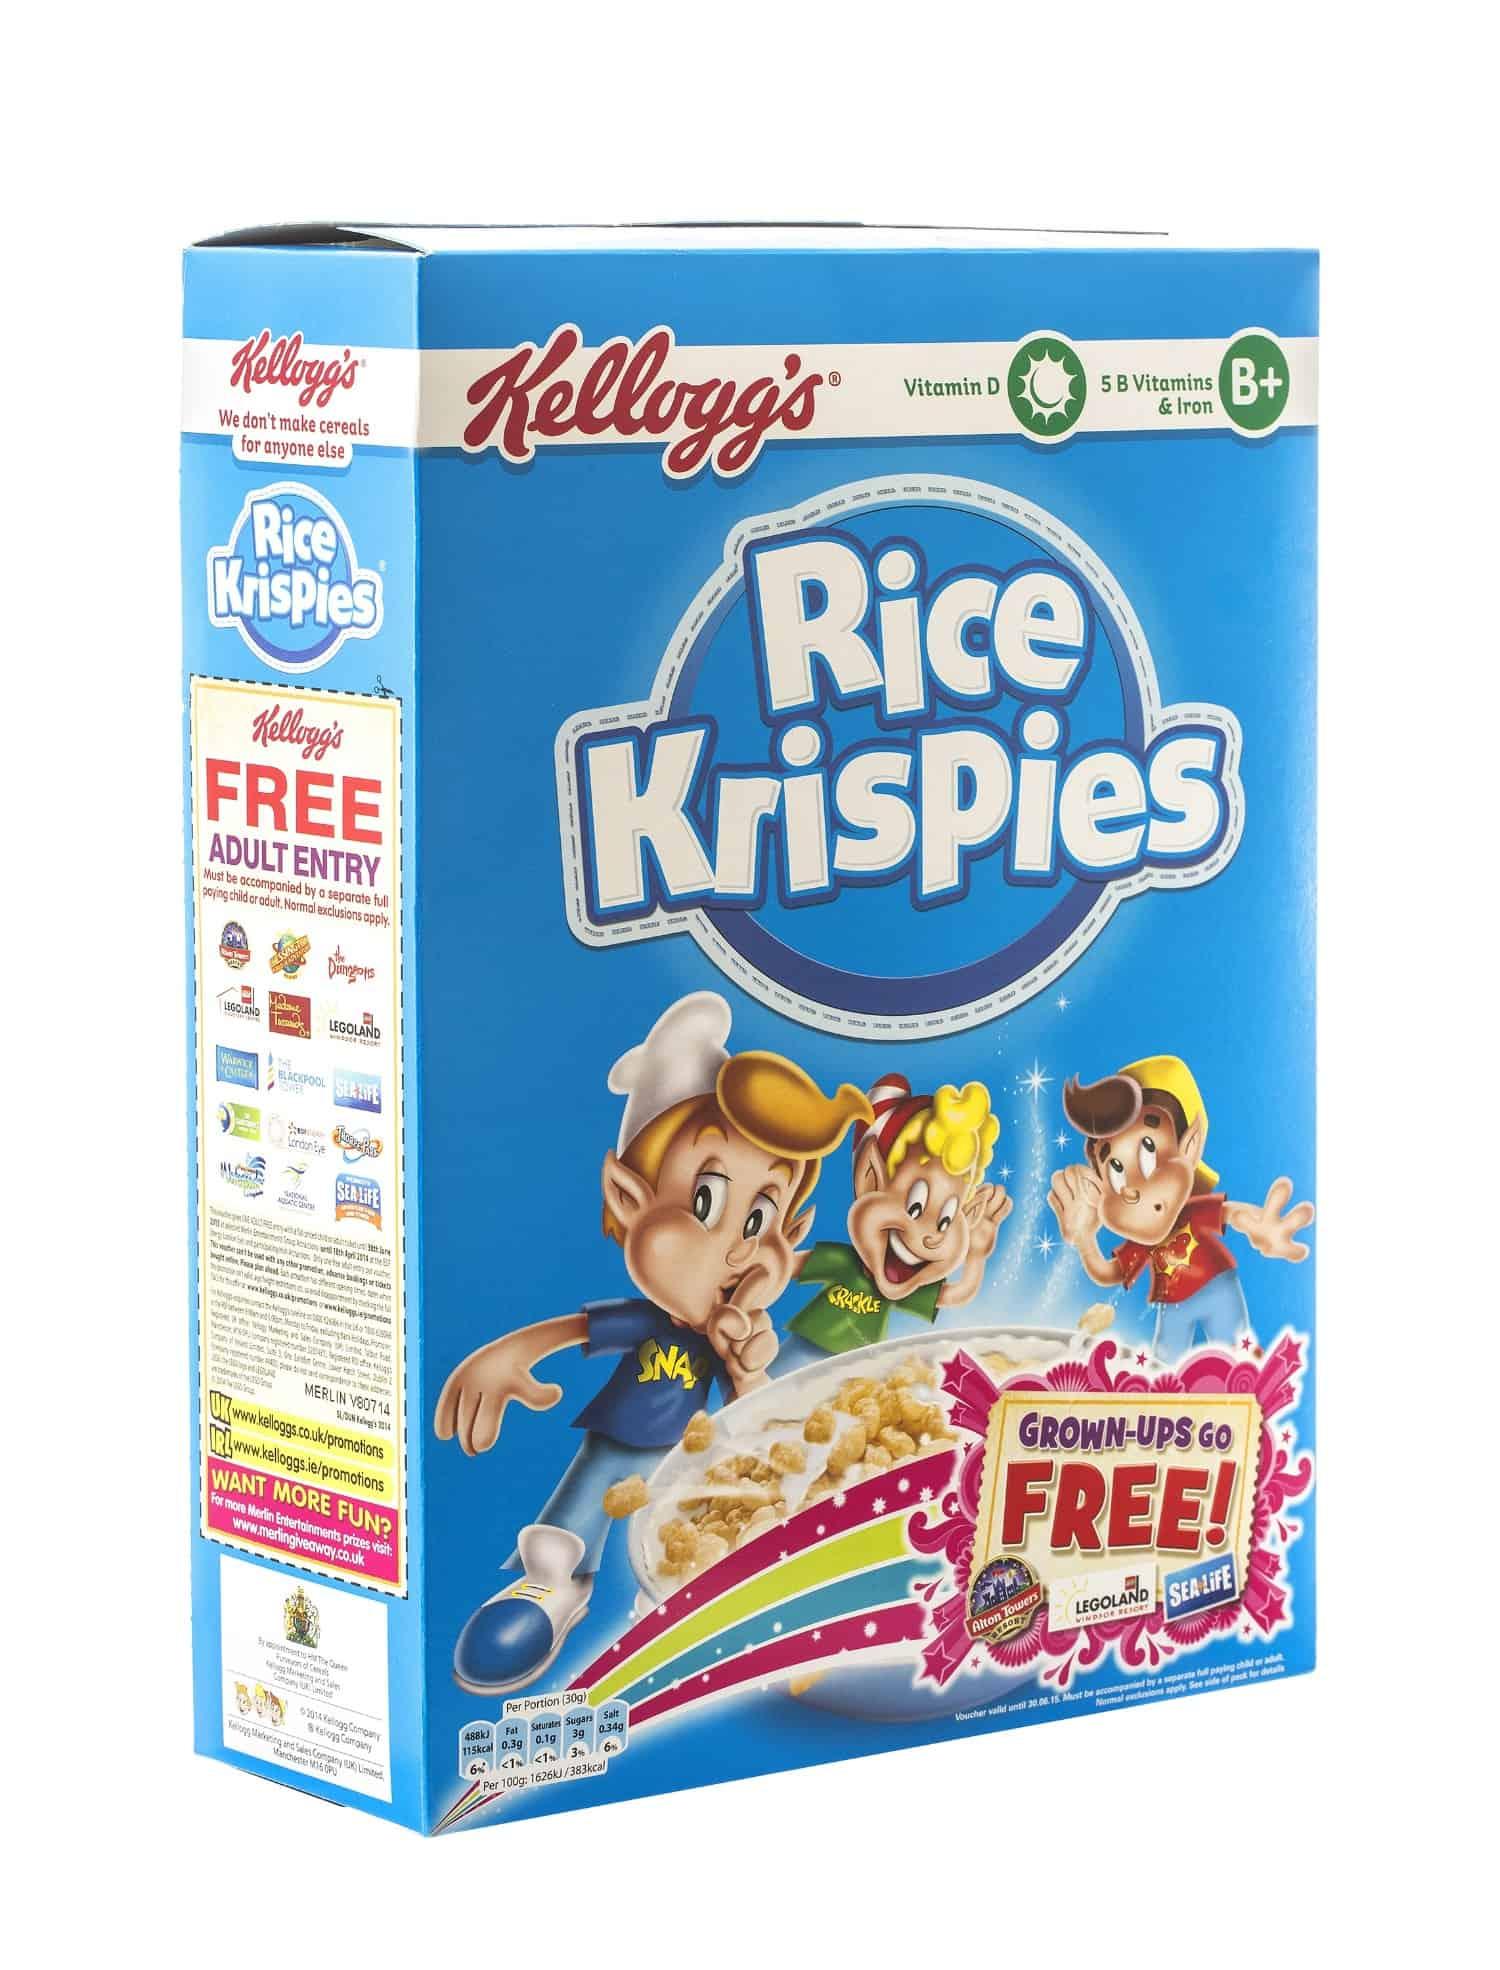 The Original Rice Krispies